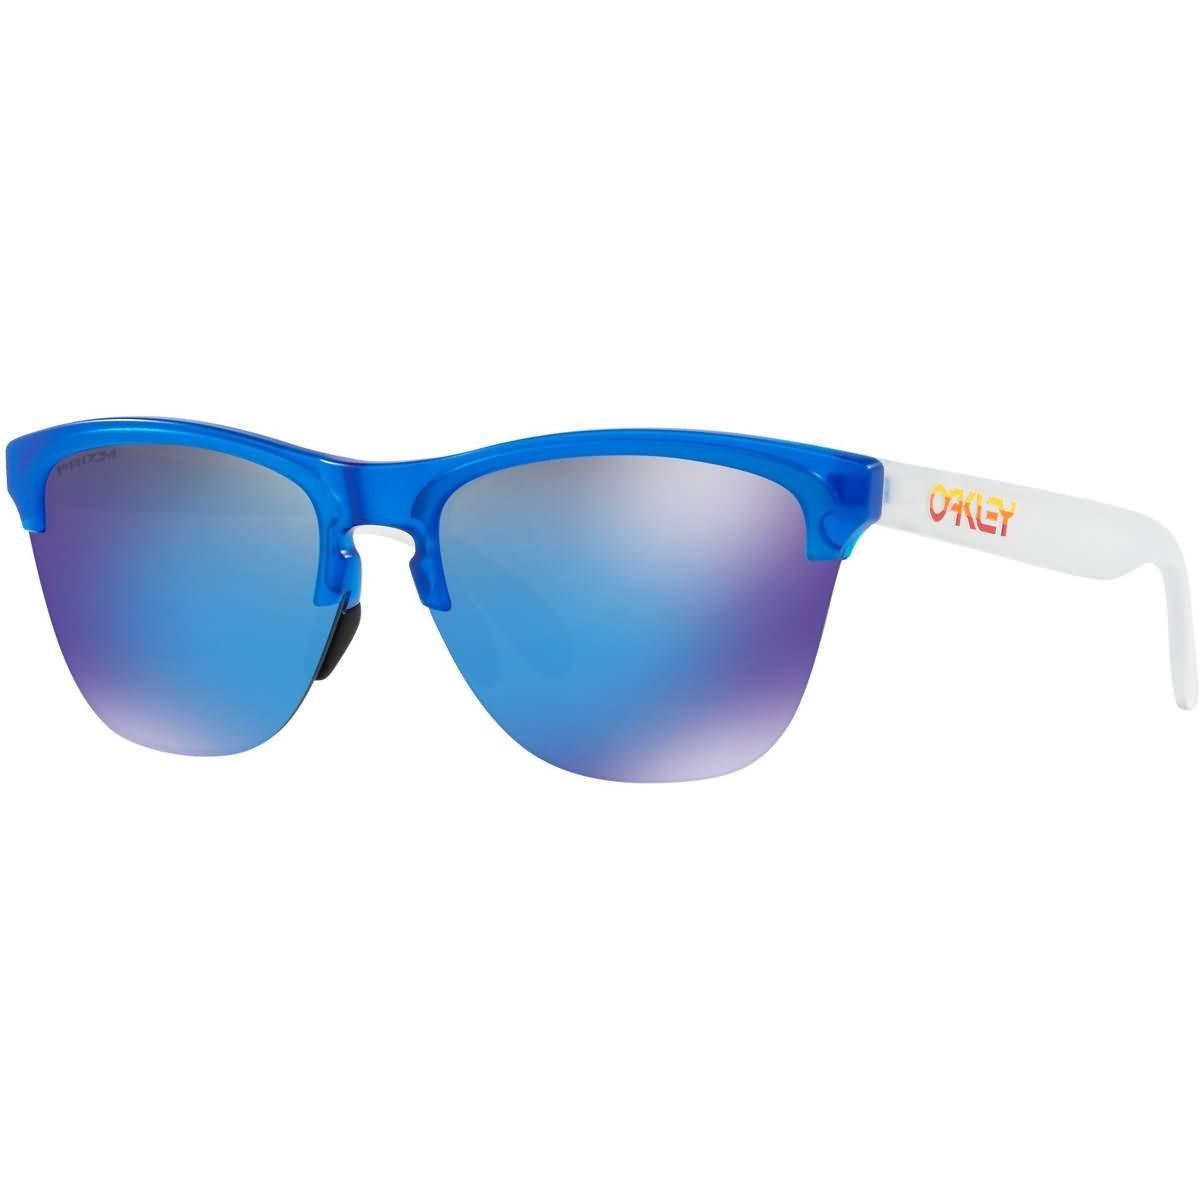 Oakley Men's OO9374 Frogskins Lite Round Sunglasses, Matte Translucent Sapphire/Prizm Sapphire, 63 mm by Oakley